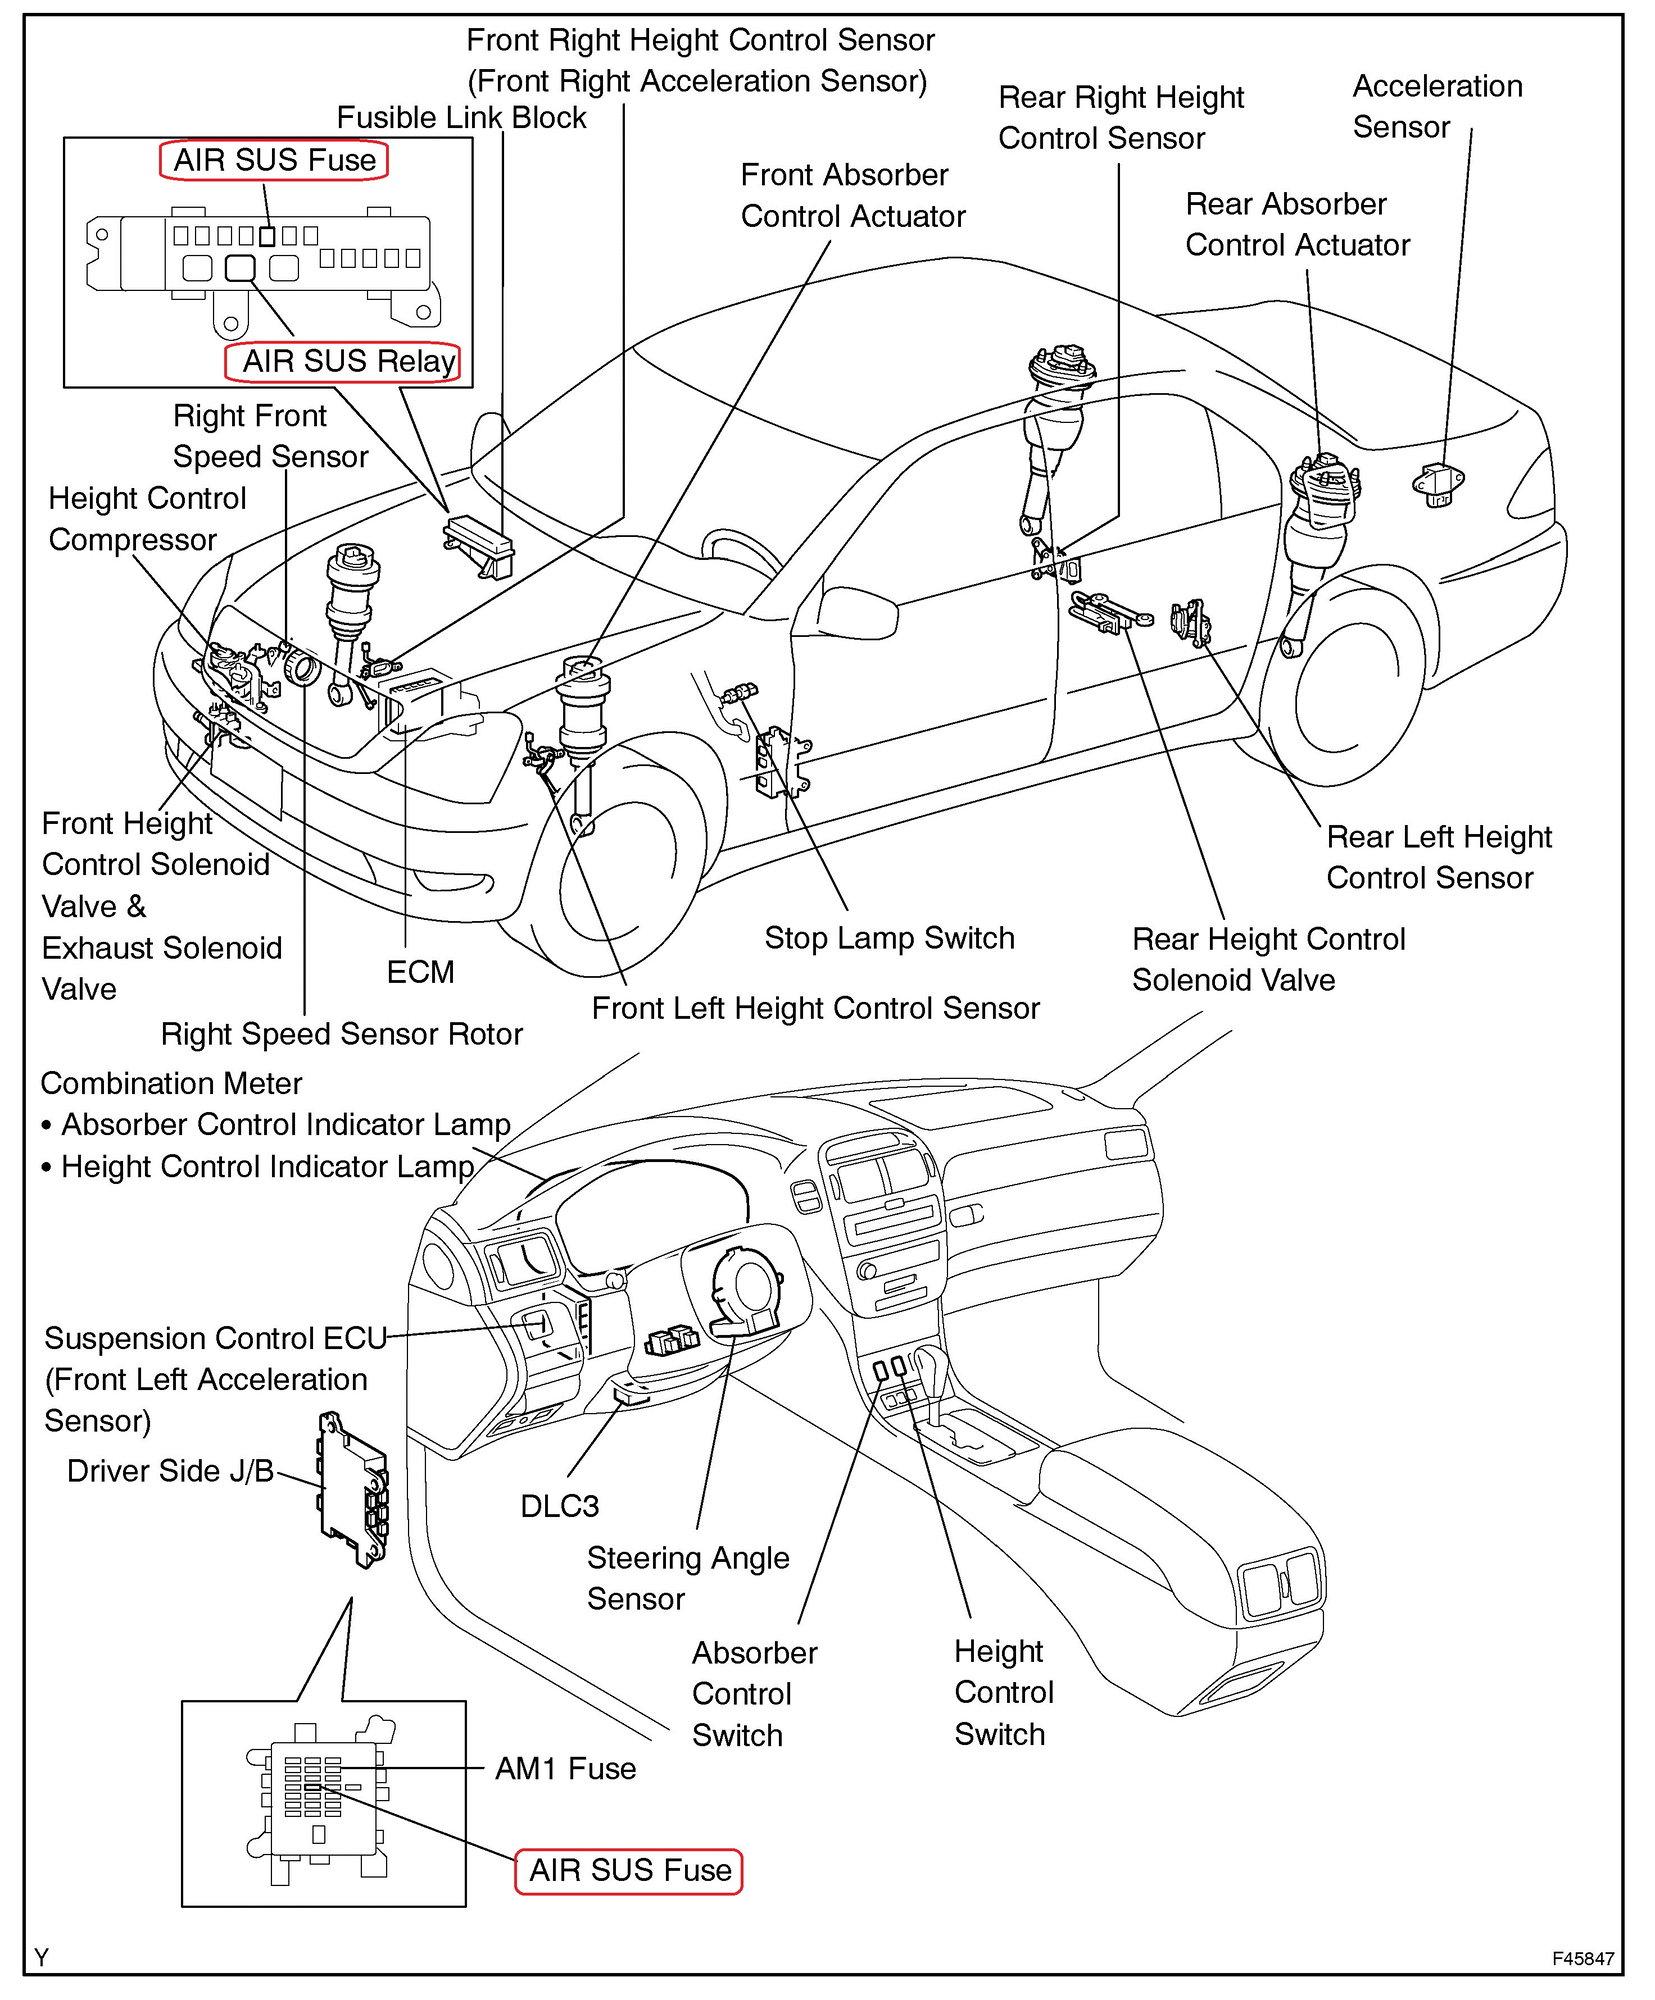 tags: #2001 lexus ls430 rims#2004 lexus ls430 interior#2004 lexus ls430  ultra package#lexus ls430 wheels 20#lexus ls430 parts diagram#2003 lexus  ls430